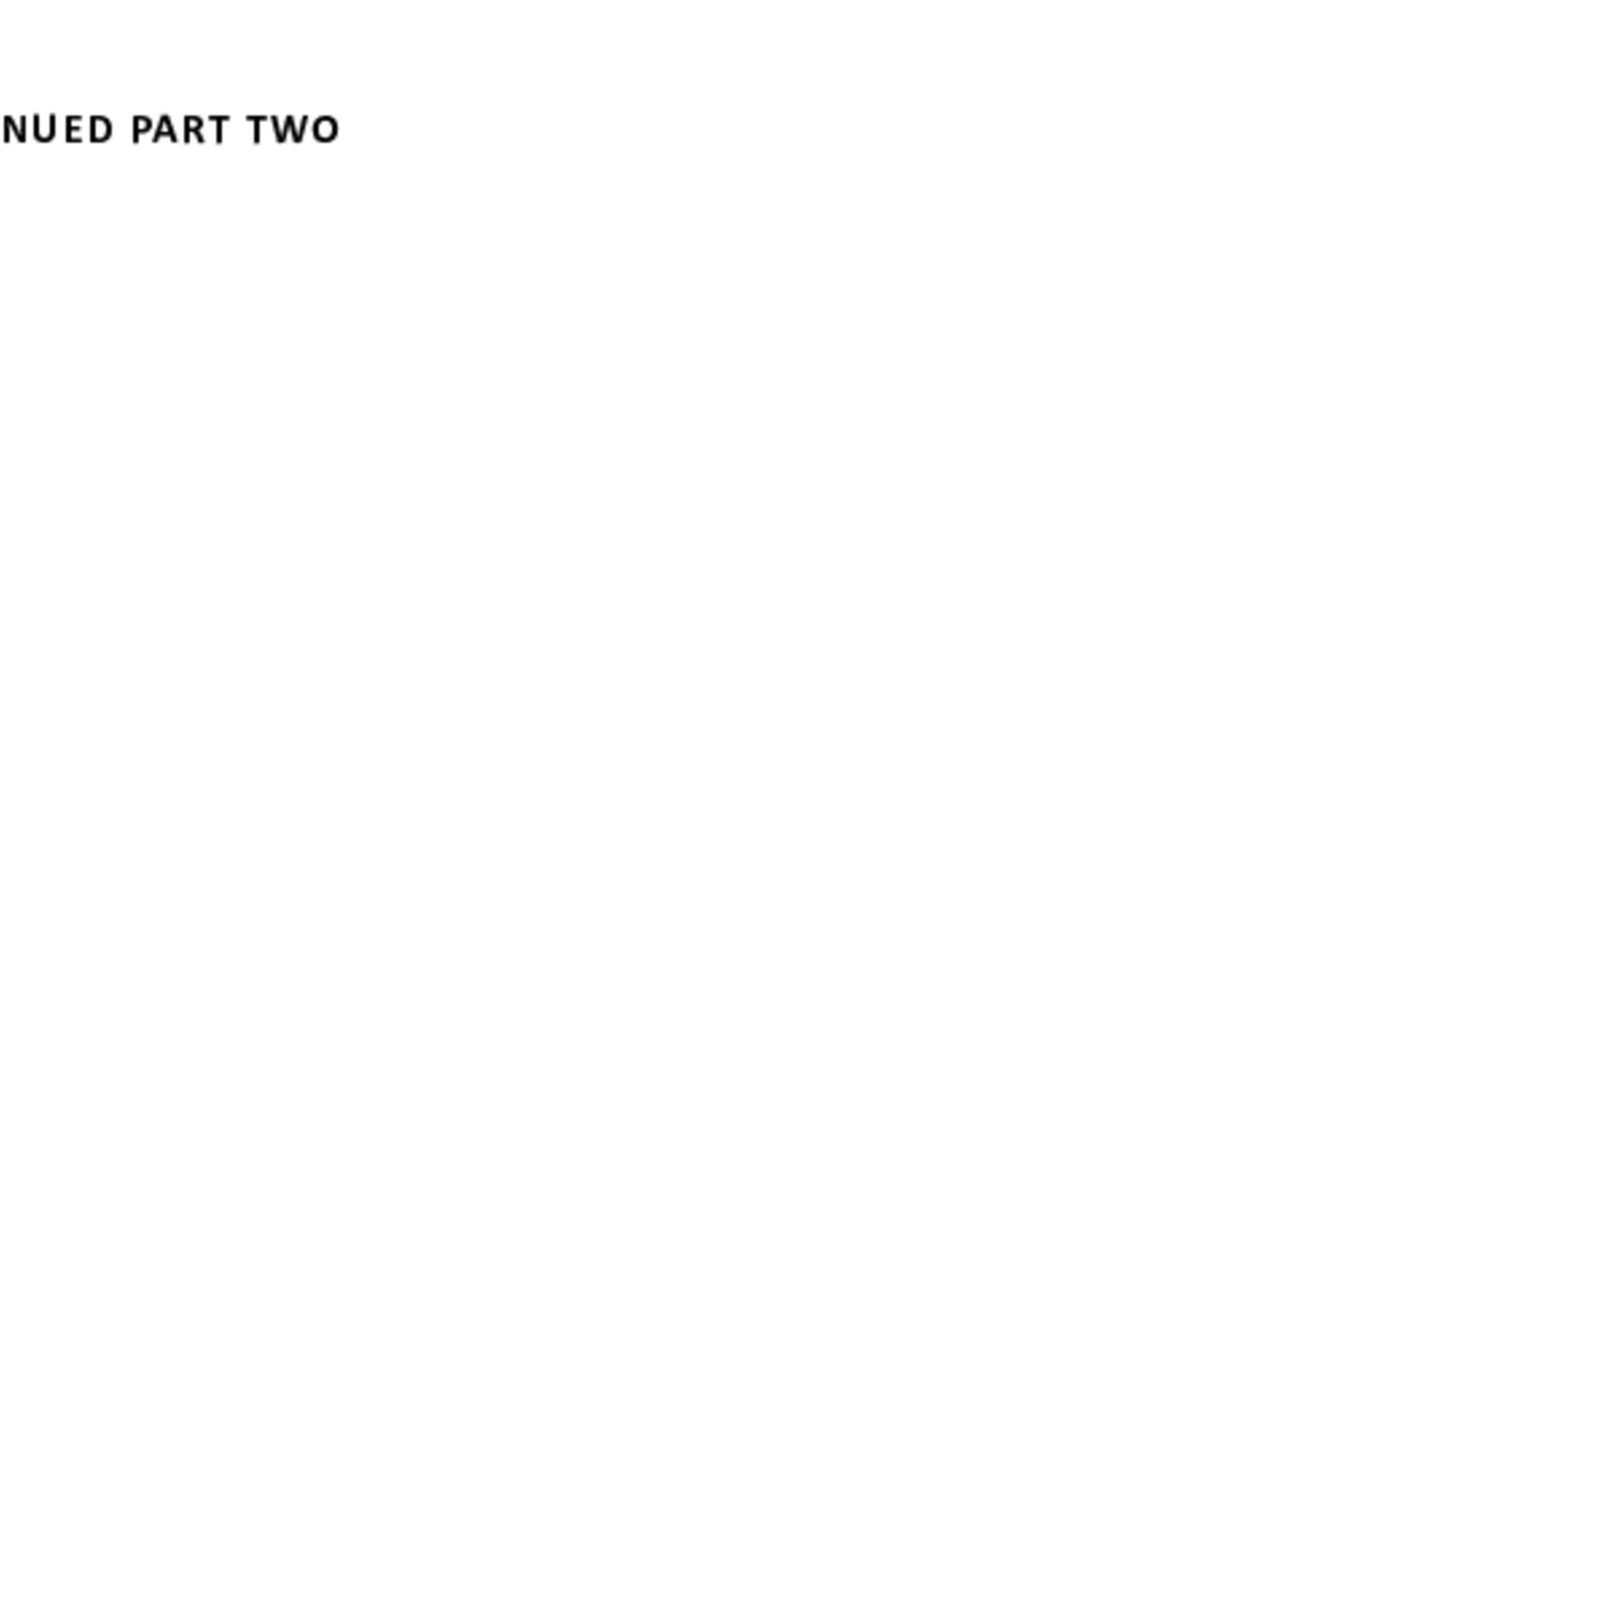 STRADBROKE HIGH SCHOOL MAG 1960 PART TWO.pdf